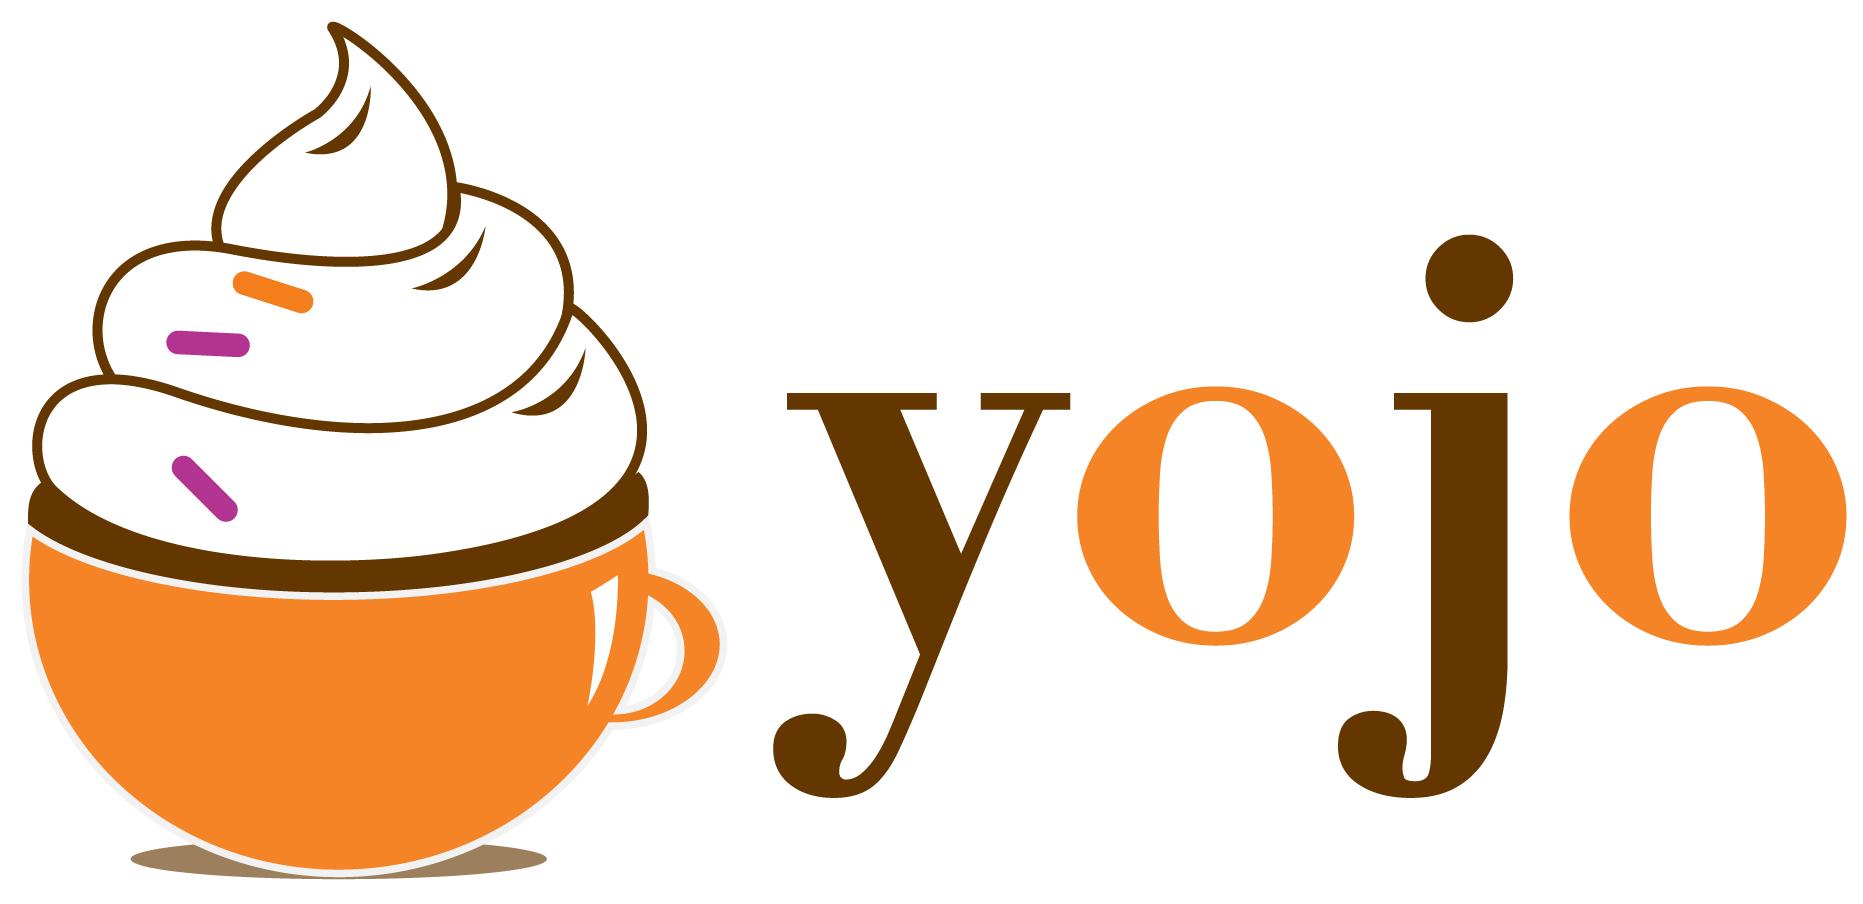 png download Yojo coffee. Frozen yogurt clipart